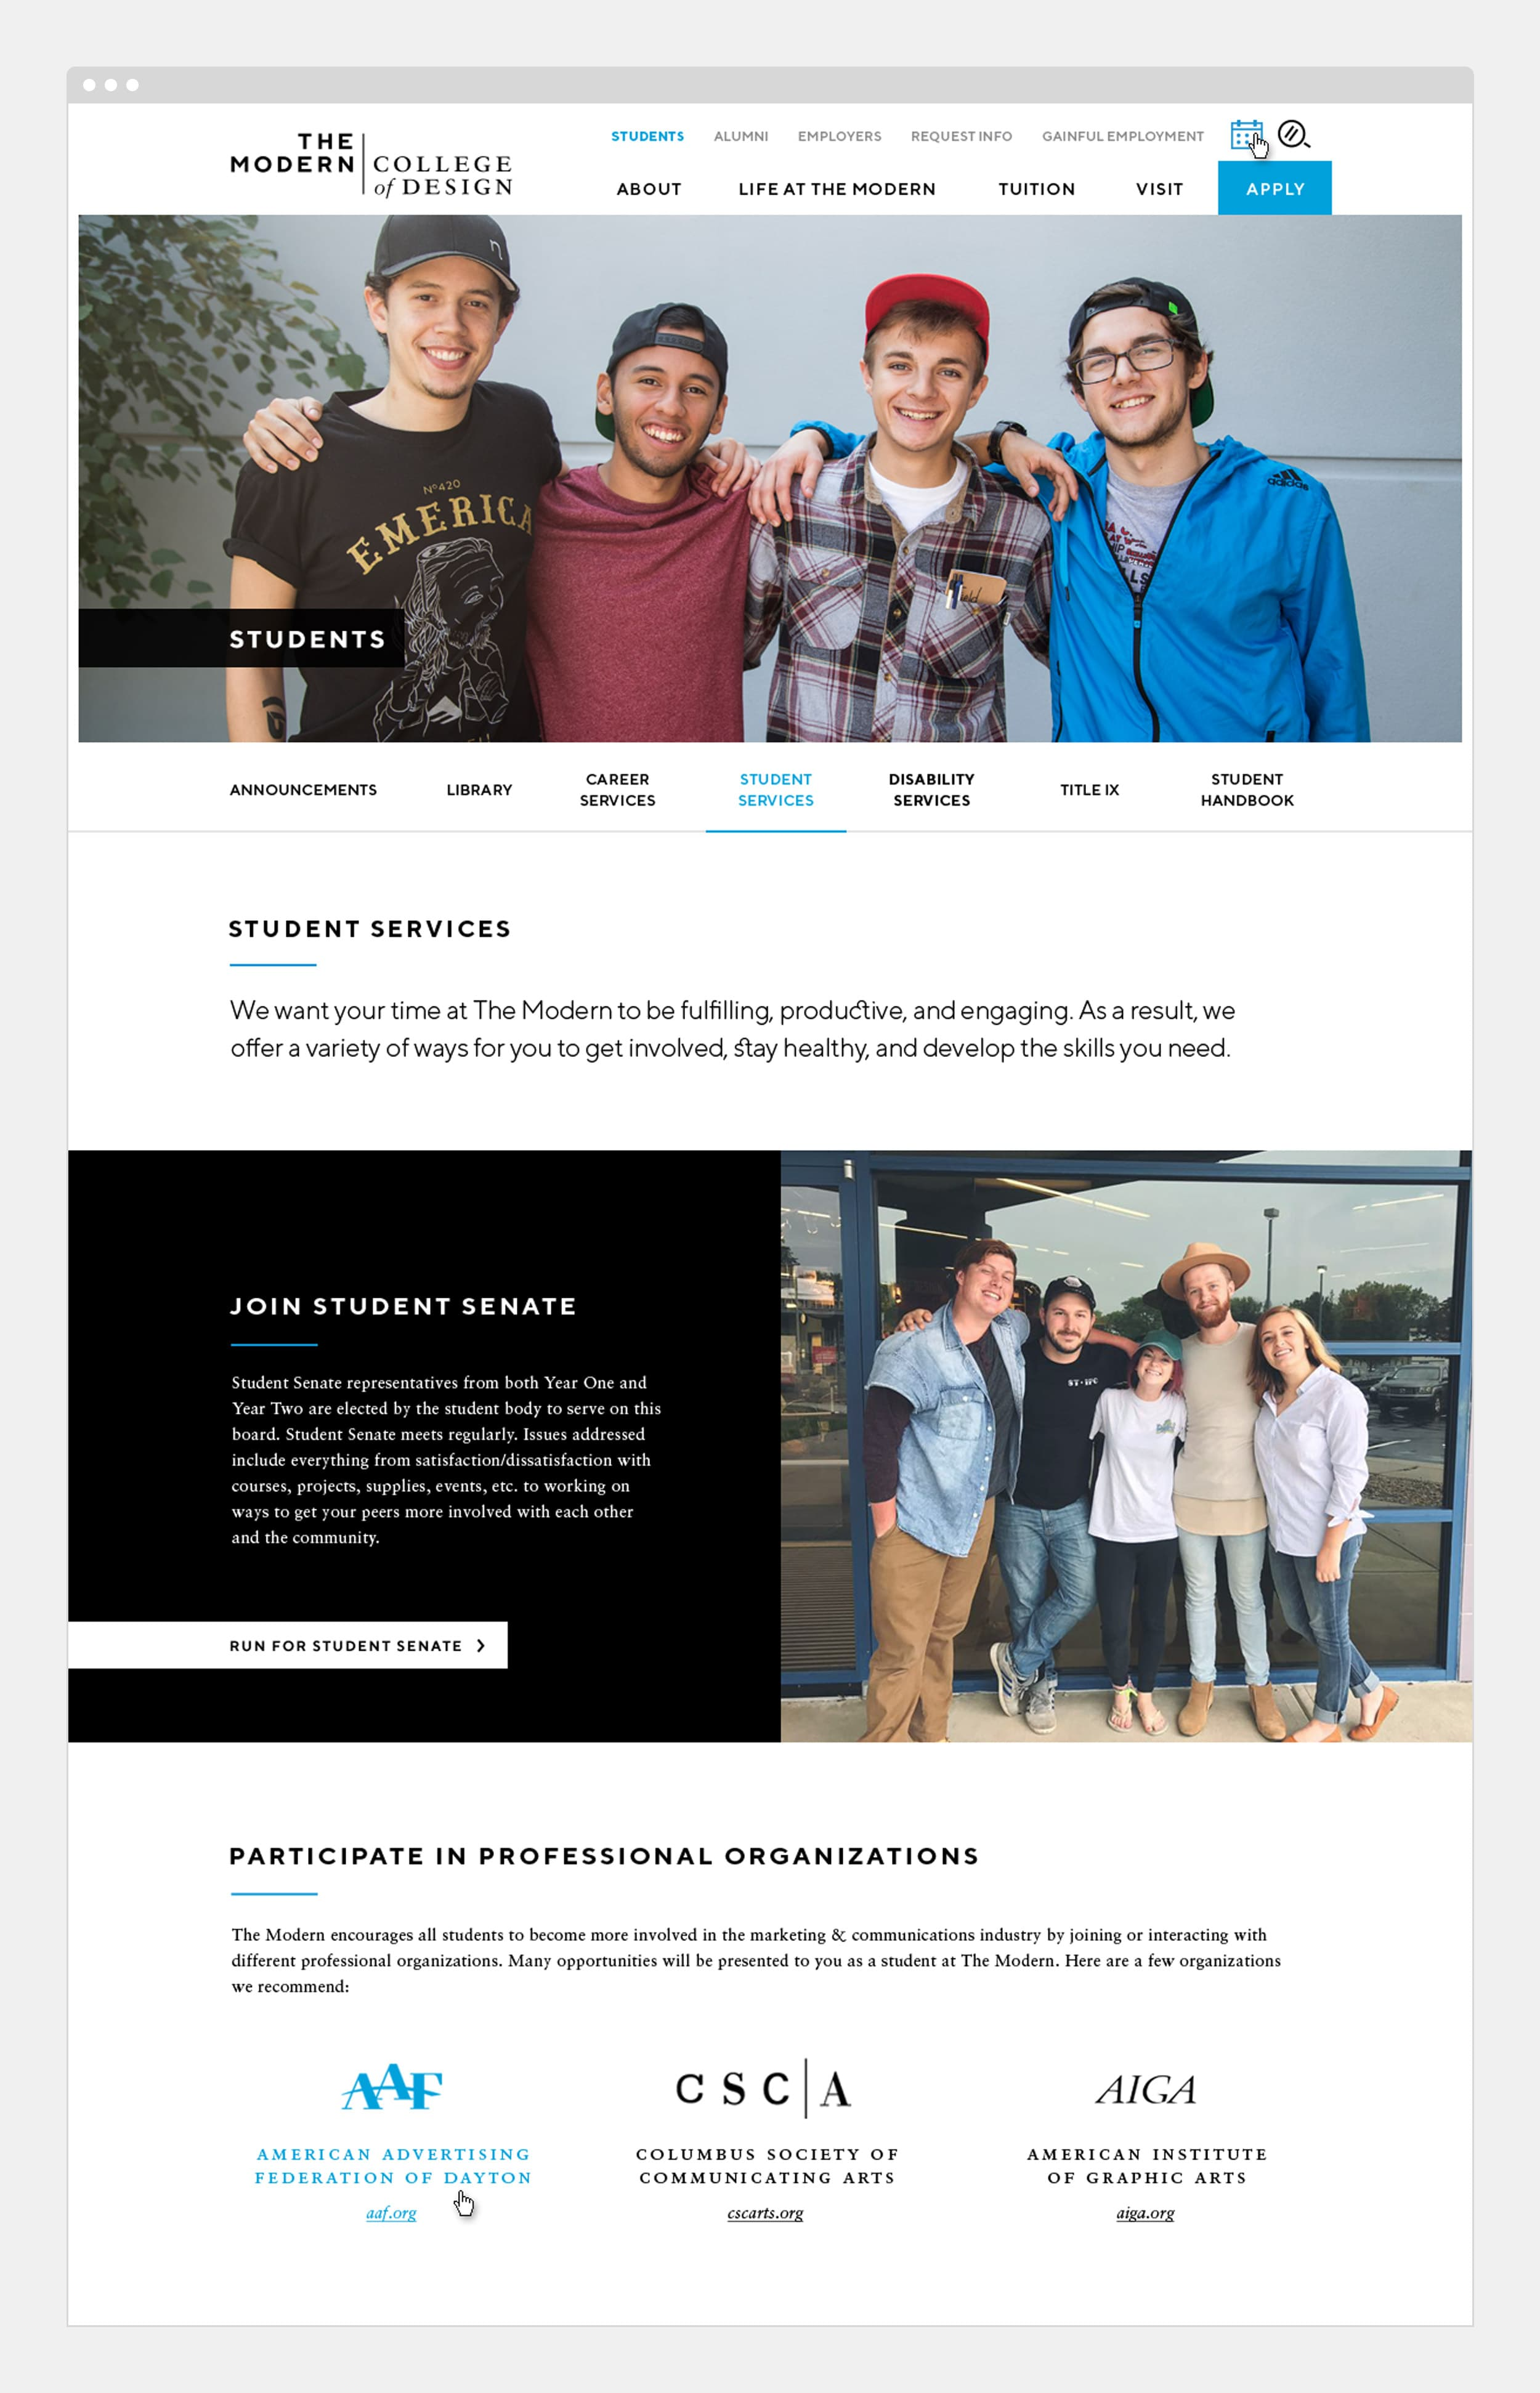 the-modern-college-of-design-website-02.jpg